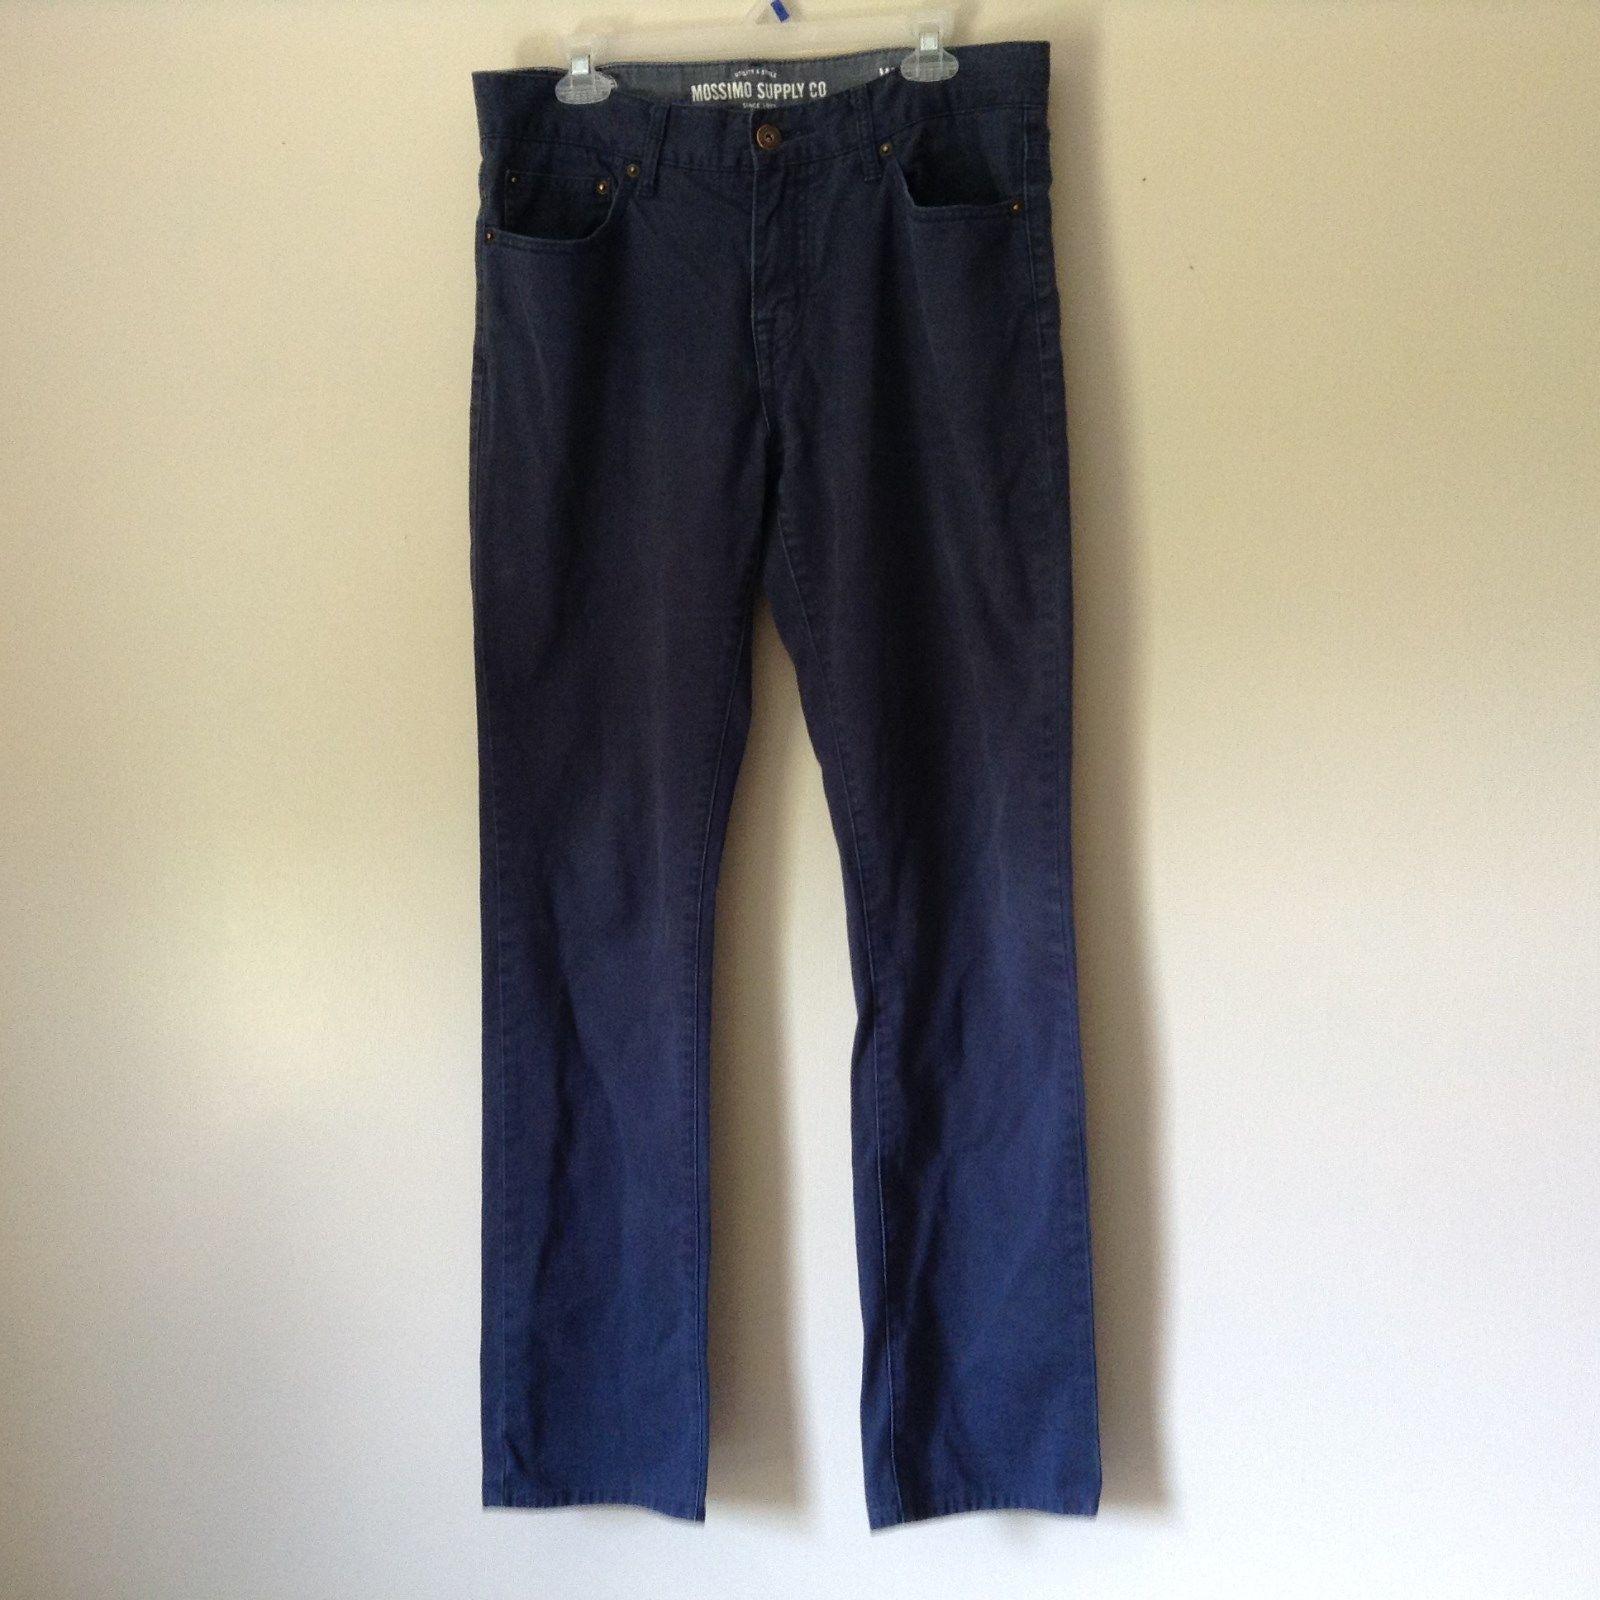 Mossimo Supply Company Blue Pants 100 Percent Cotton Size W34 x L34